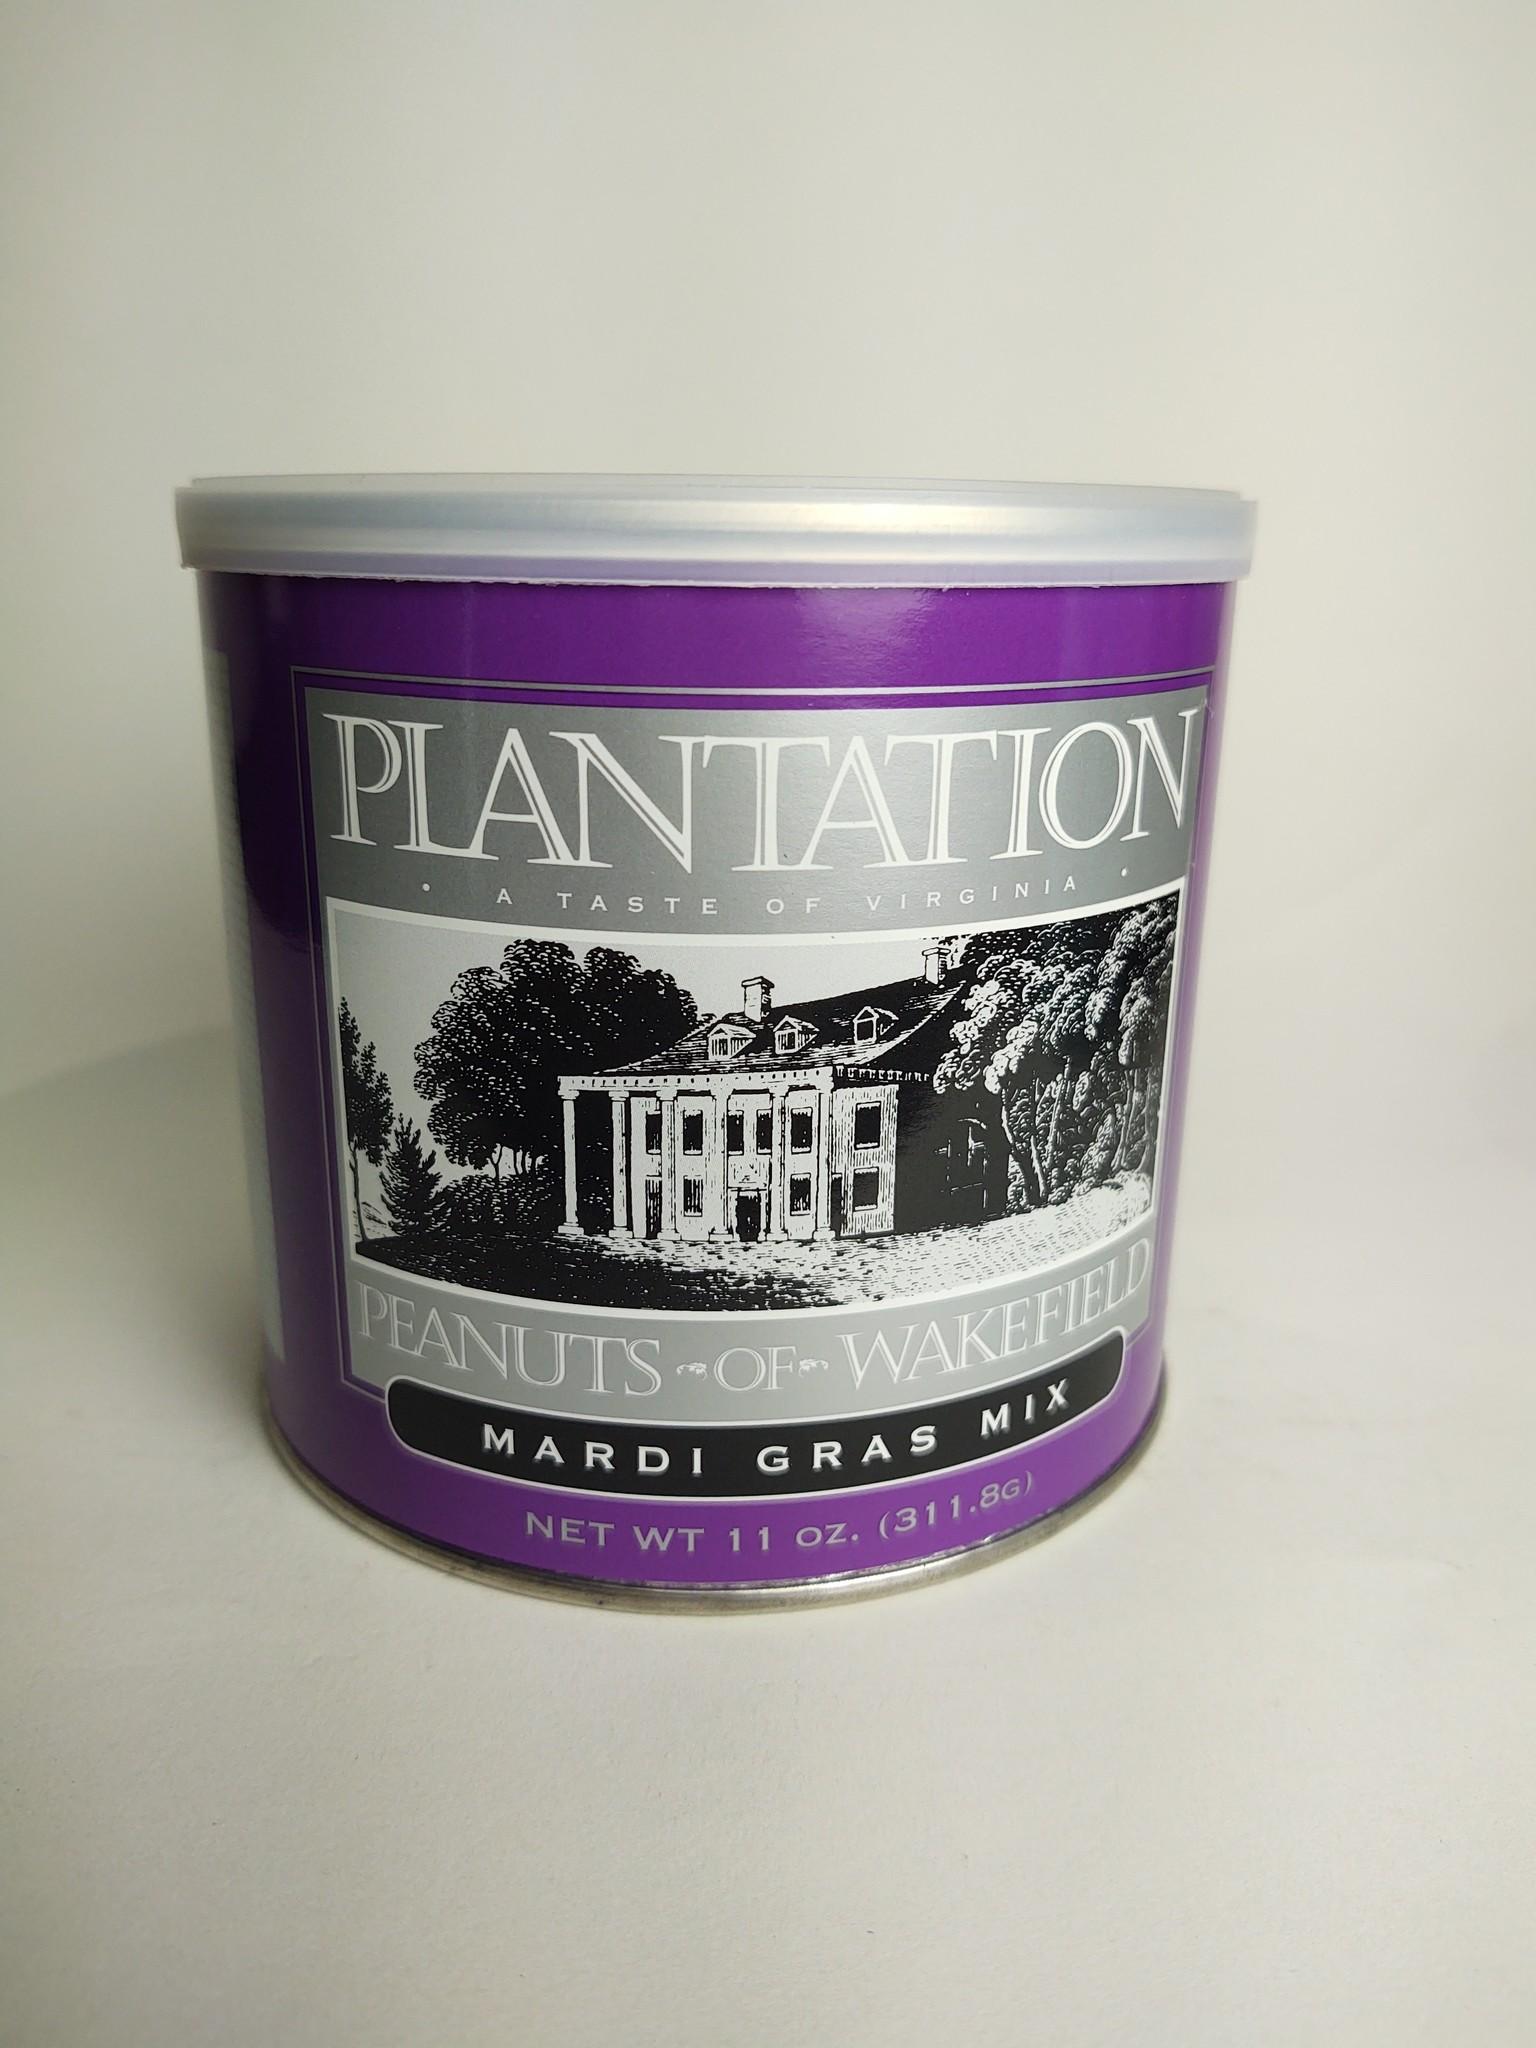 Plantation Peanuts of Wakefield Plantation Peanuts 11 oz. Gras Mix